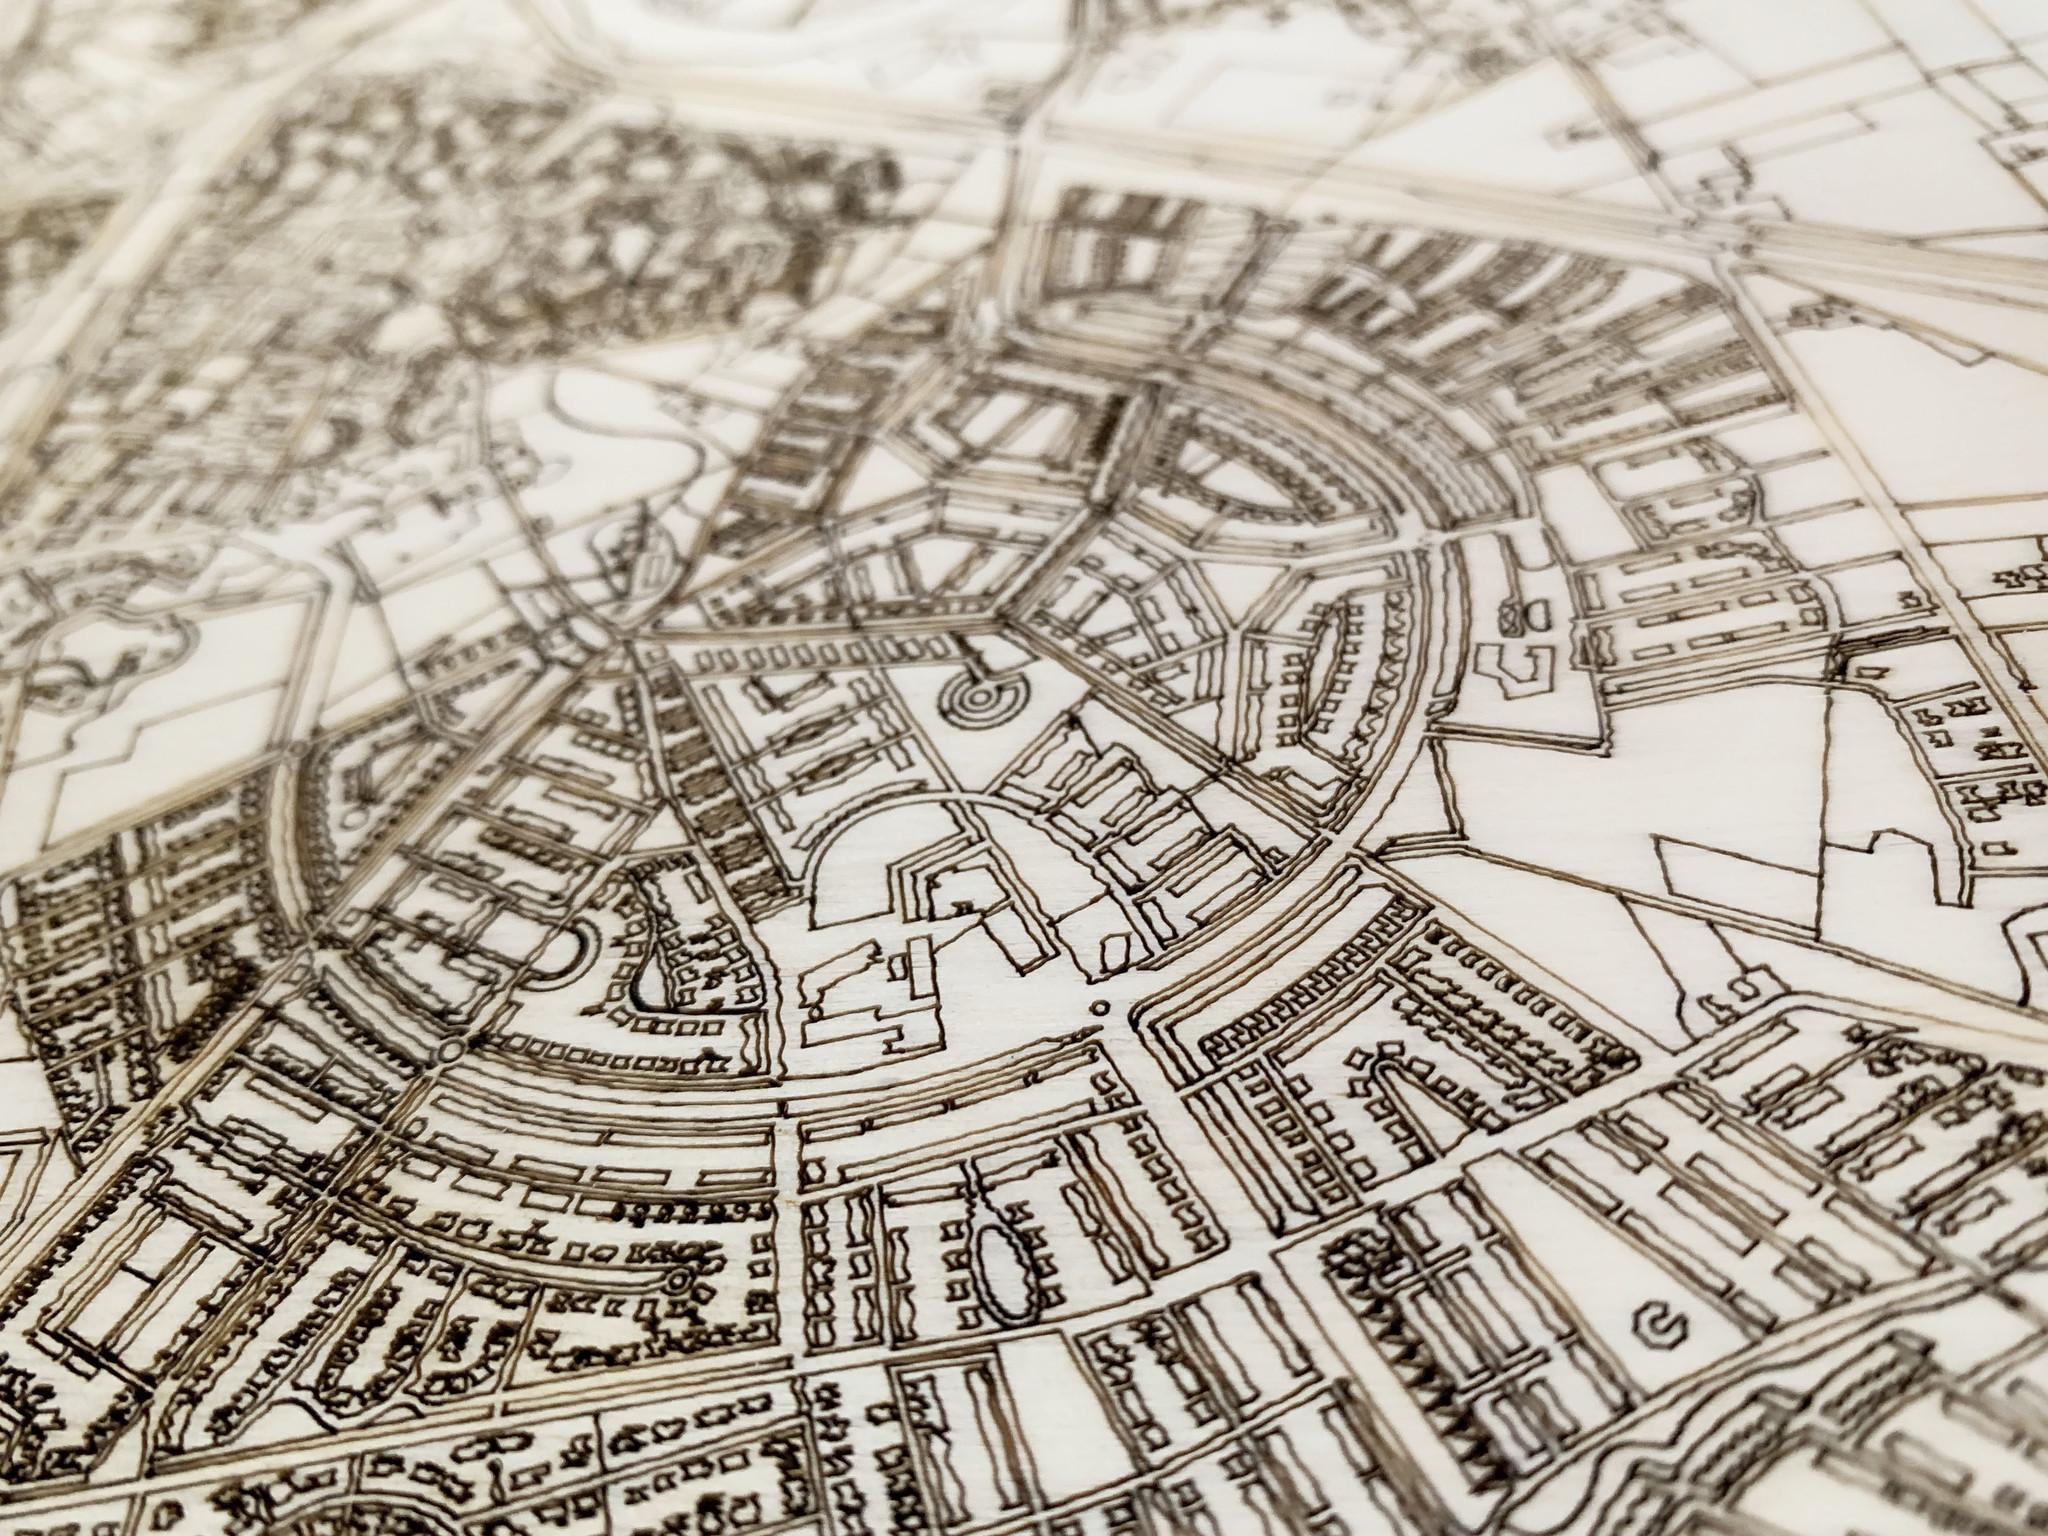 Houten stadsplattegrond Ede-3